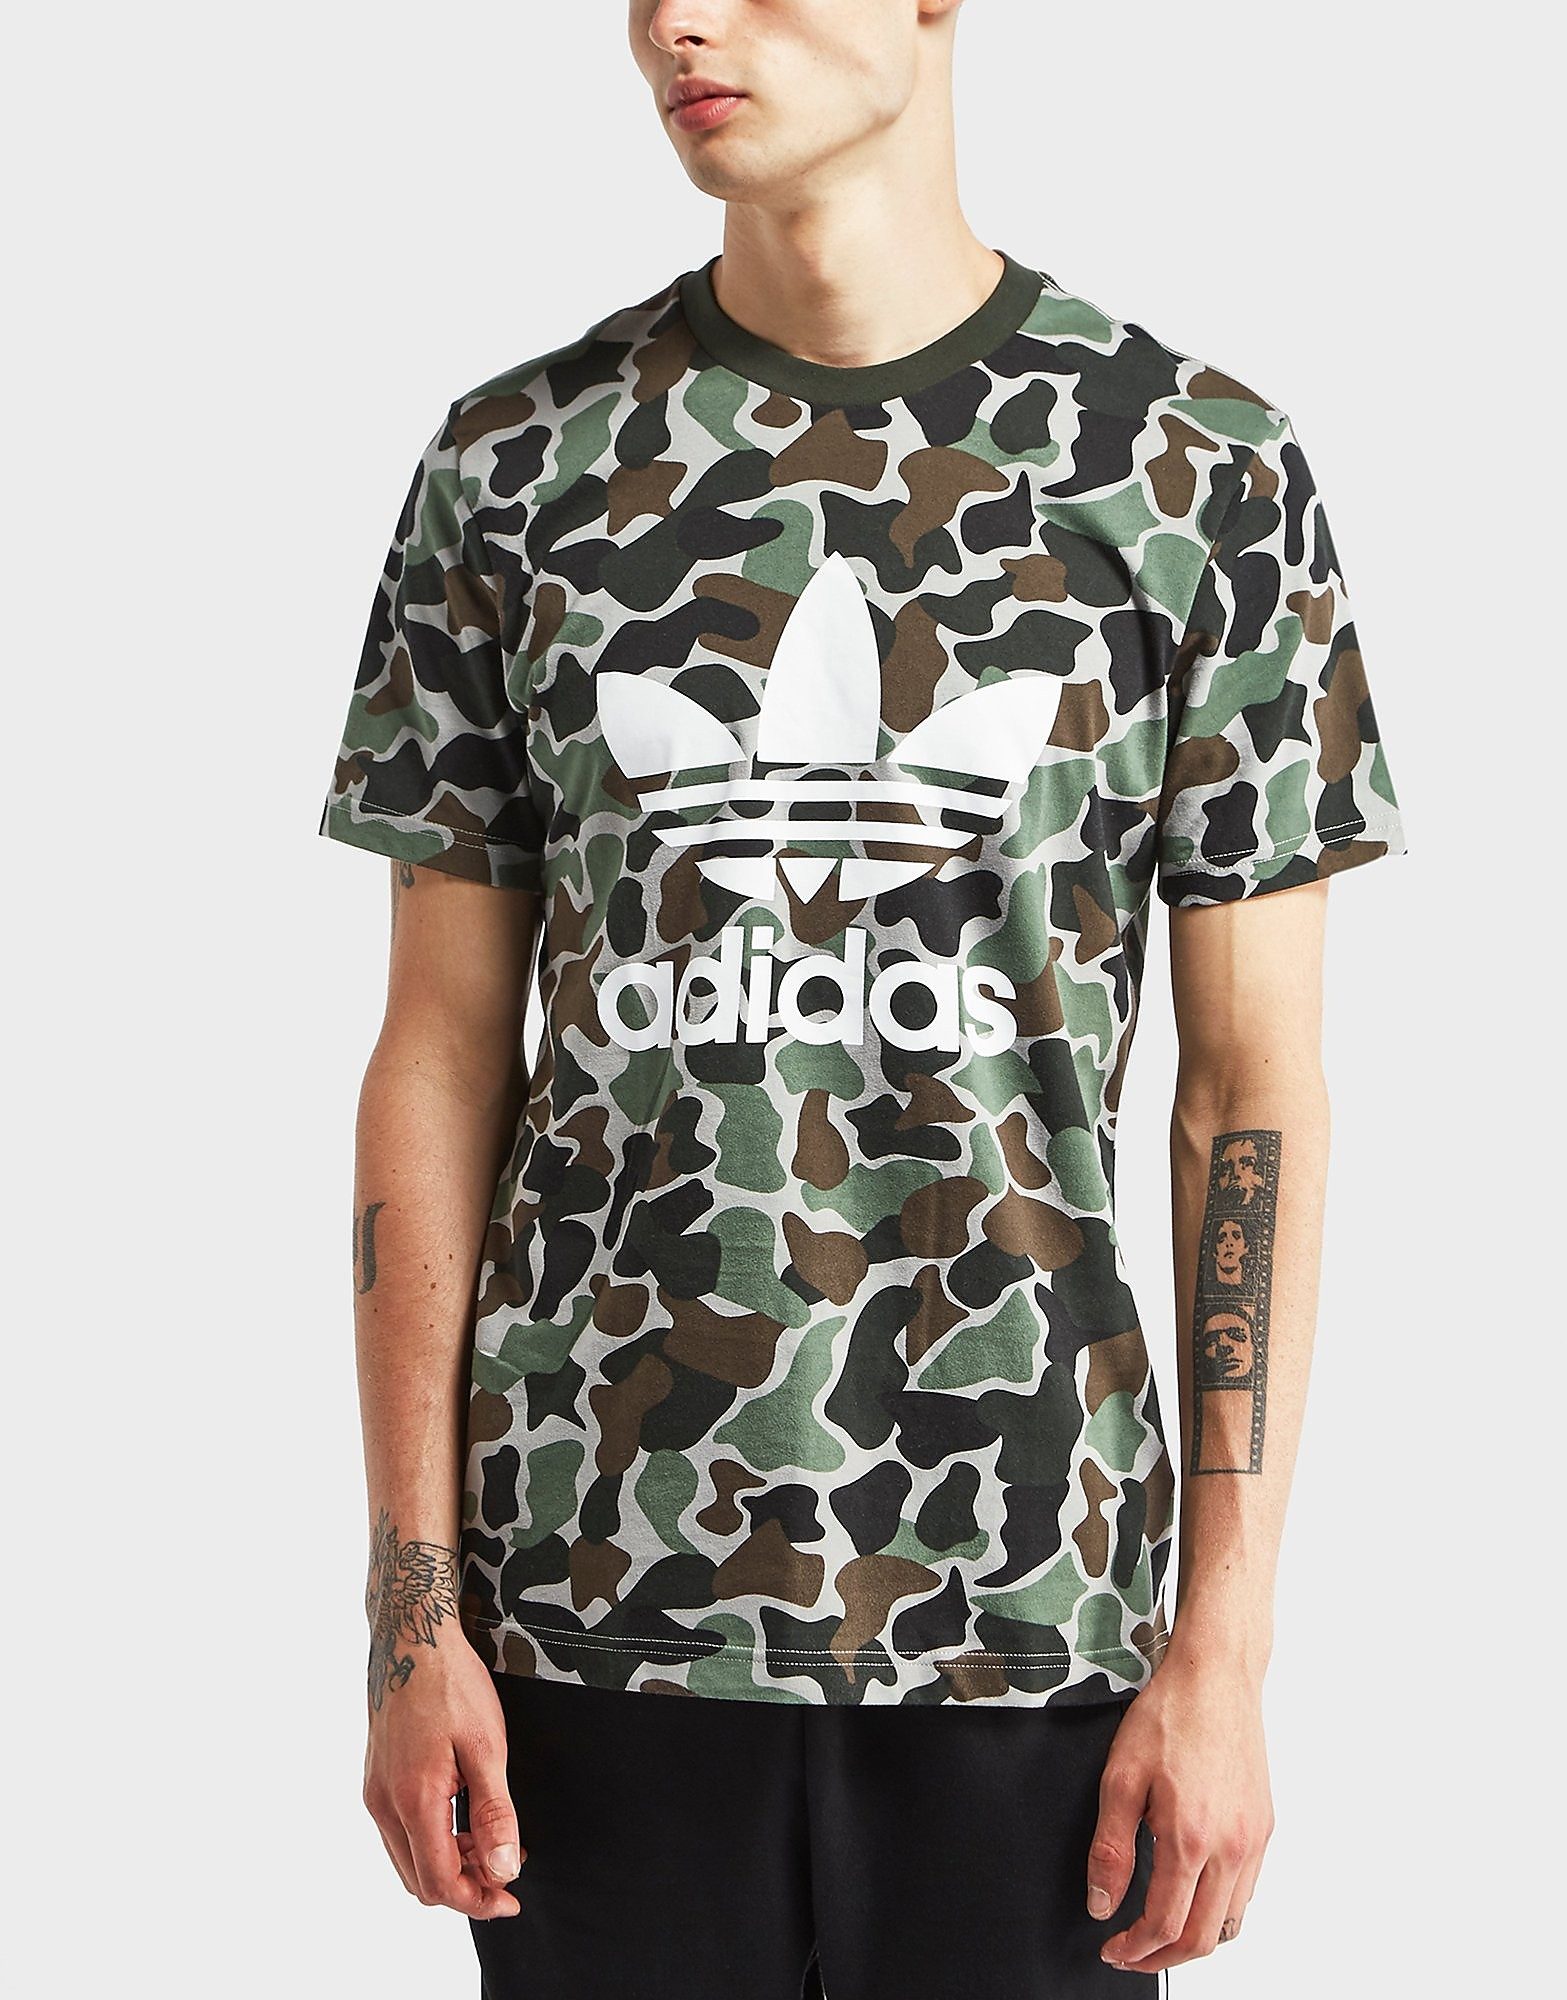 adidas Originals Camouflage Print Short Sleeve T-Shirt